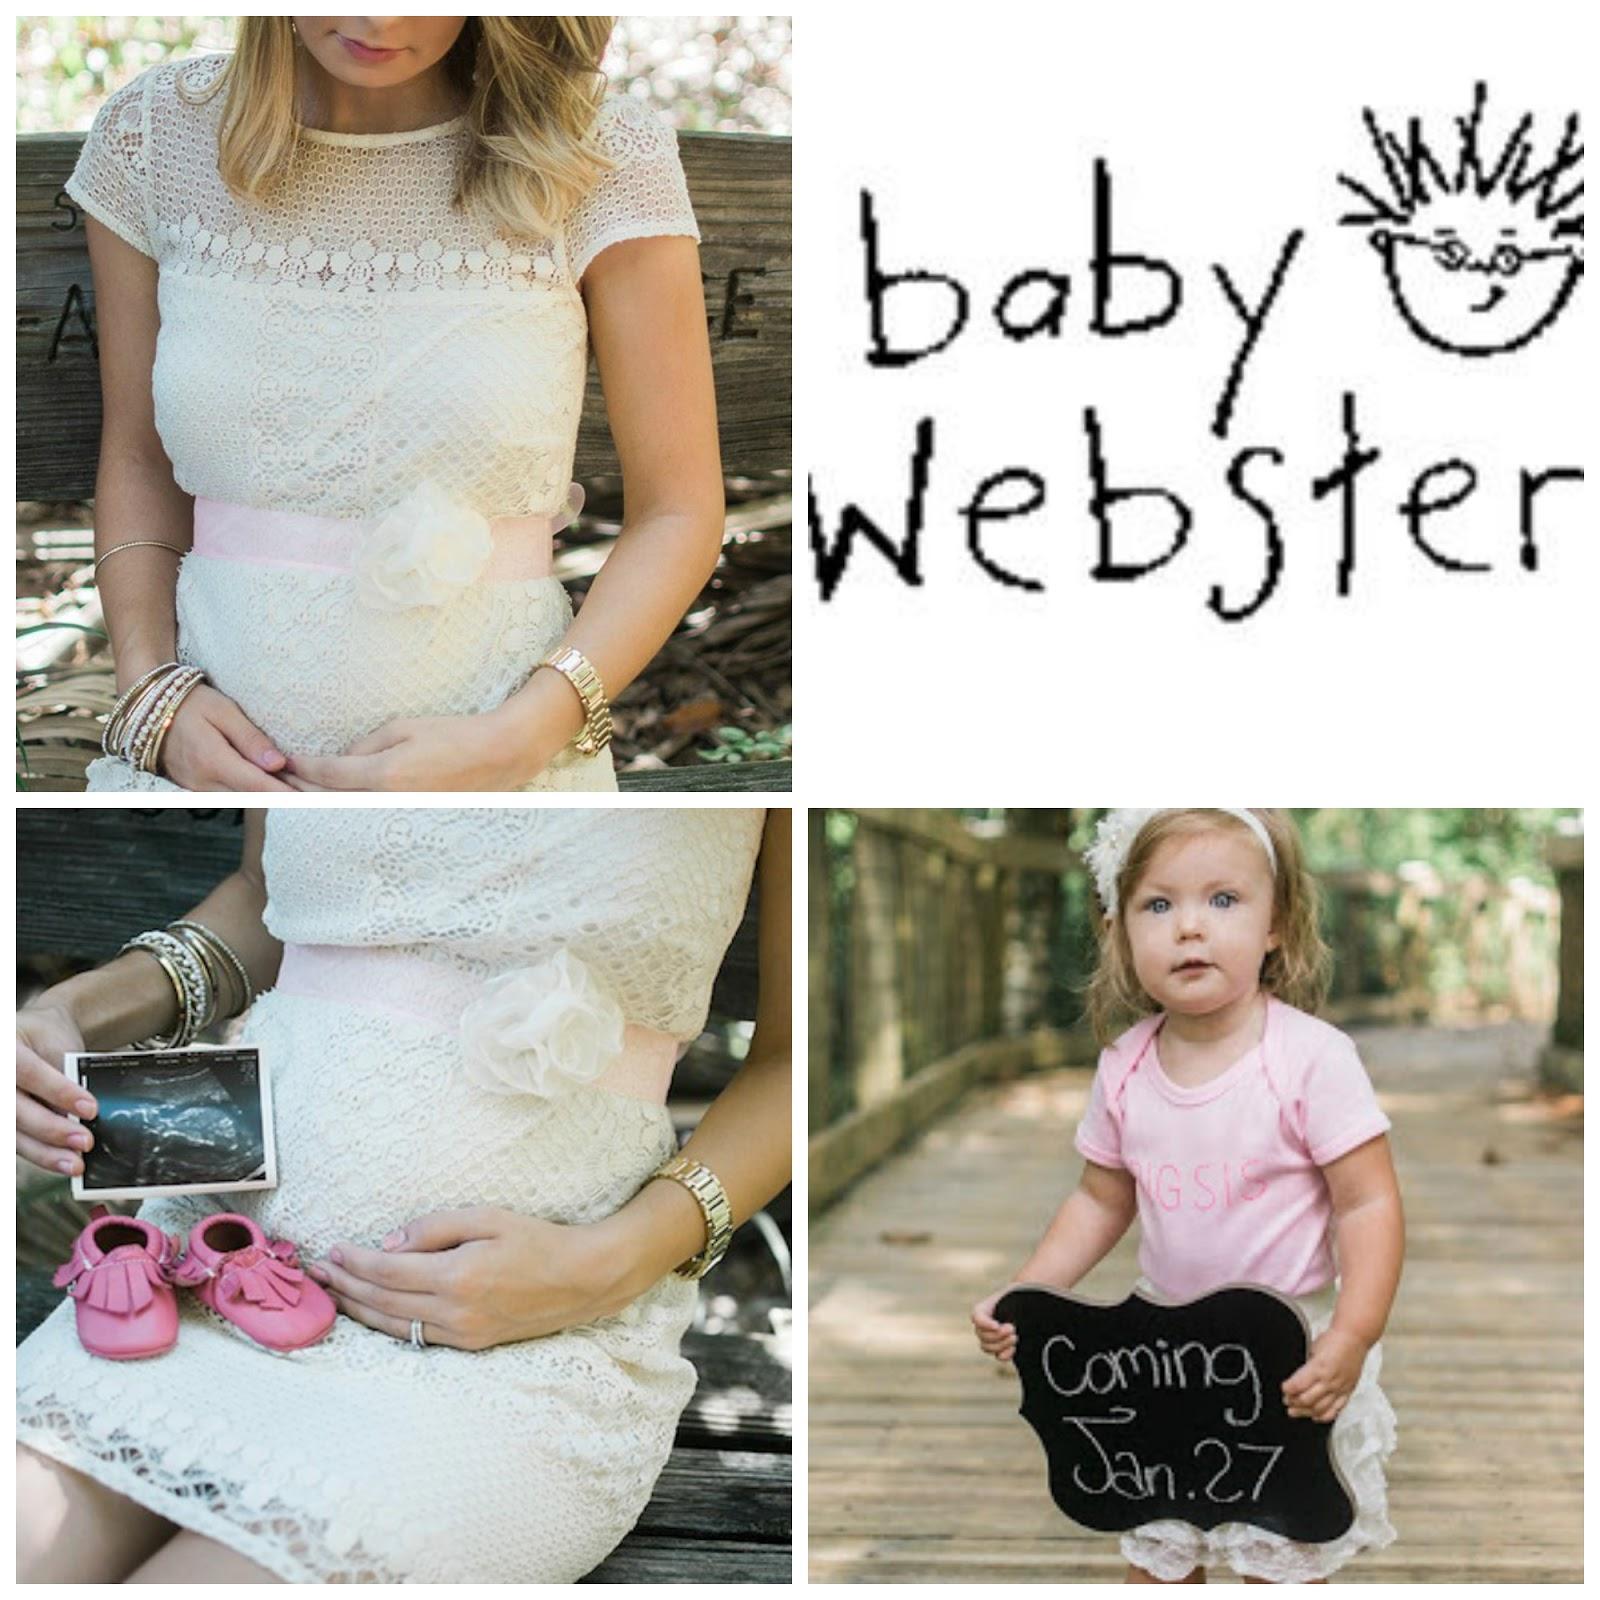 Michaella Bates Pregnant